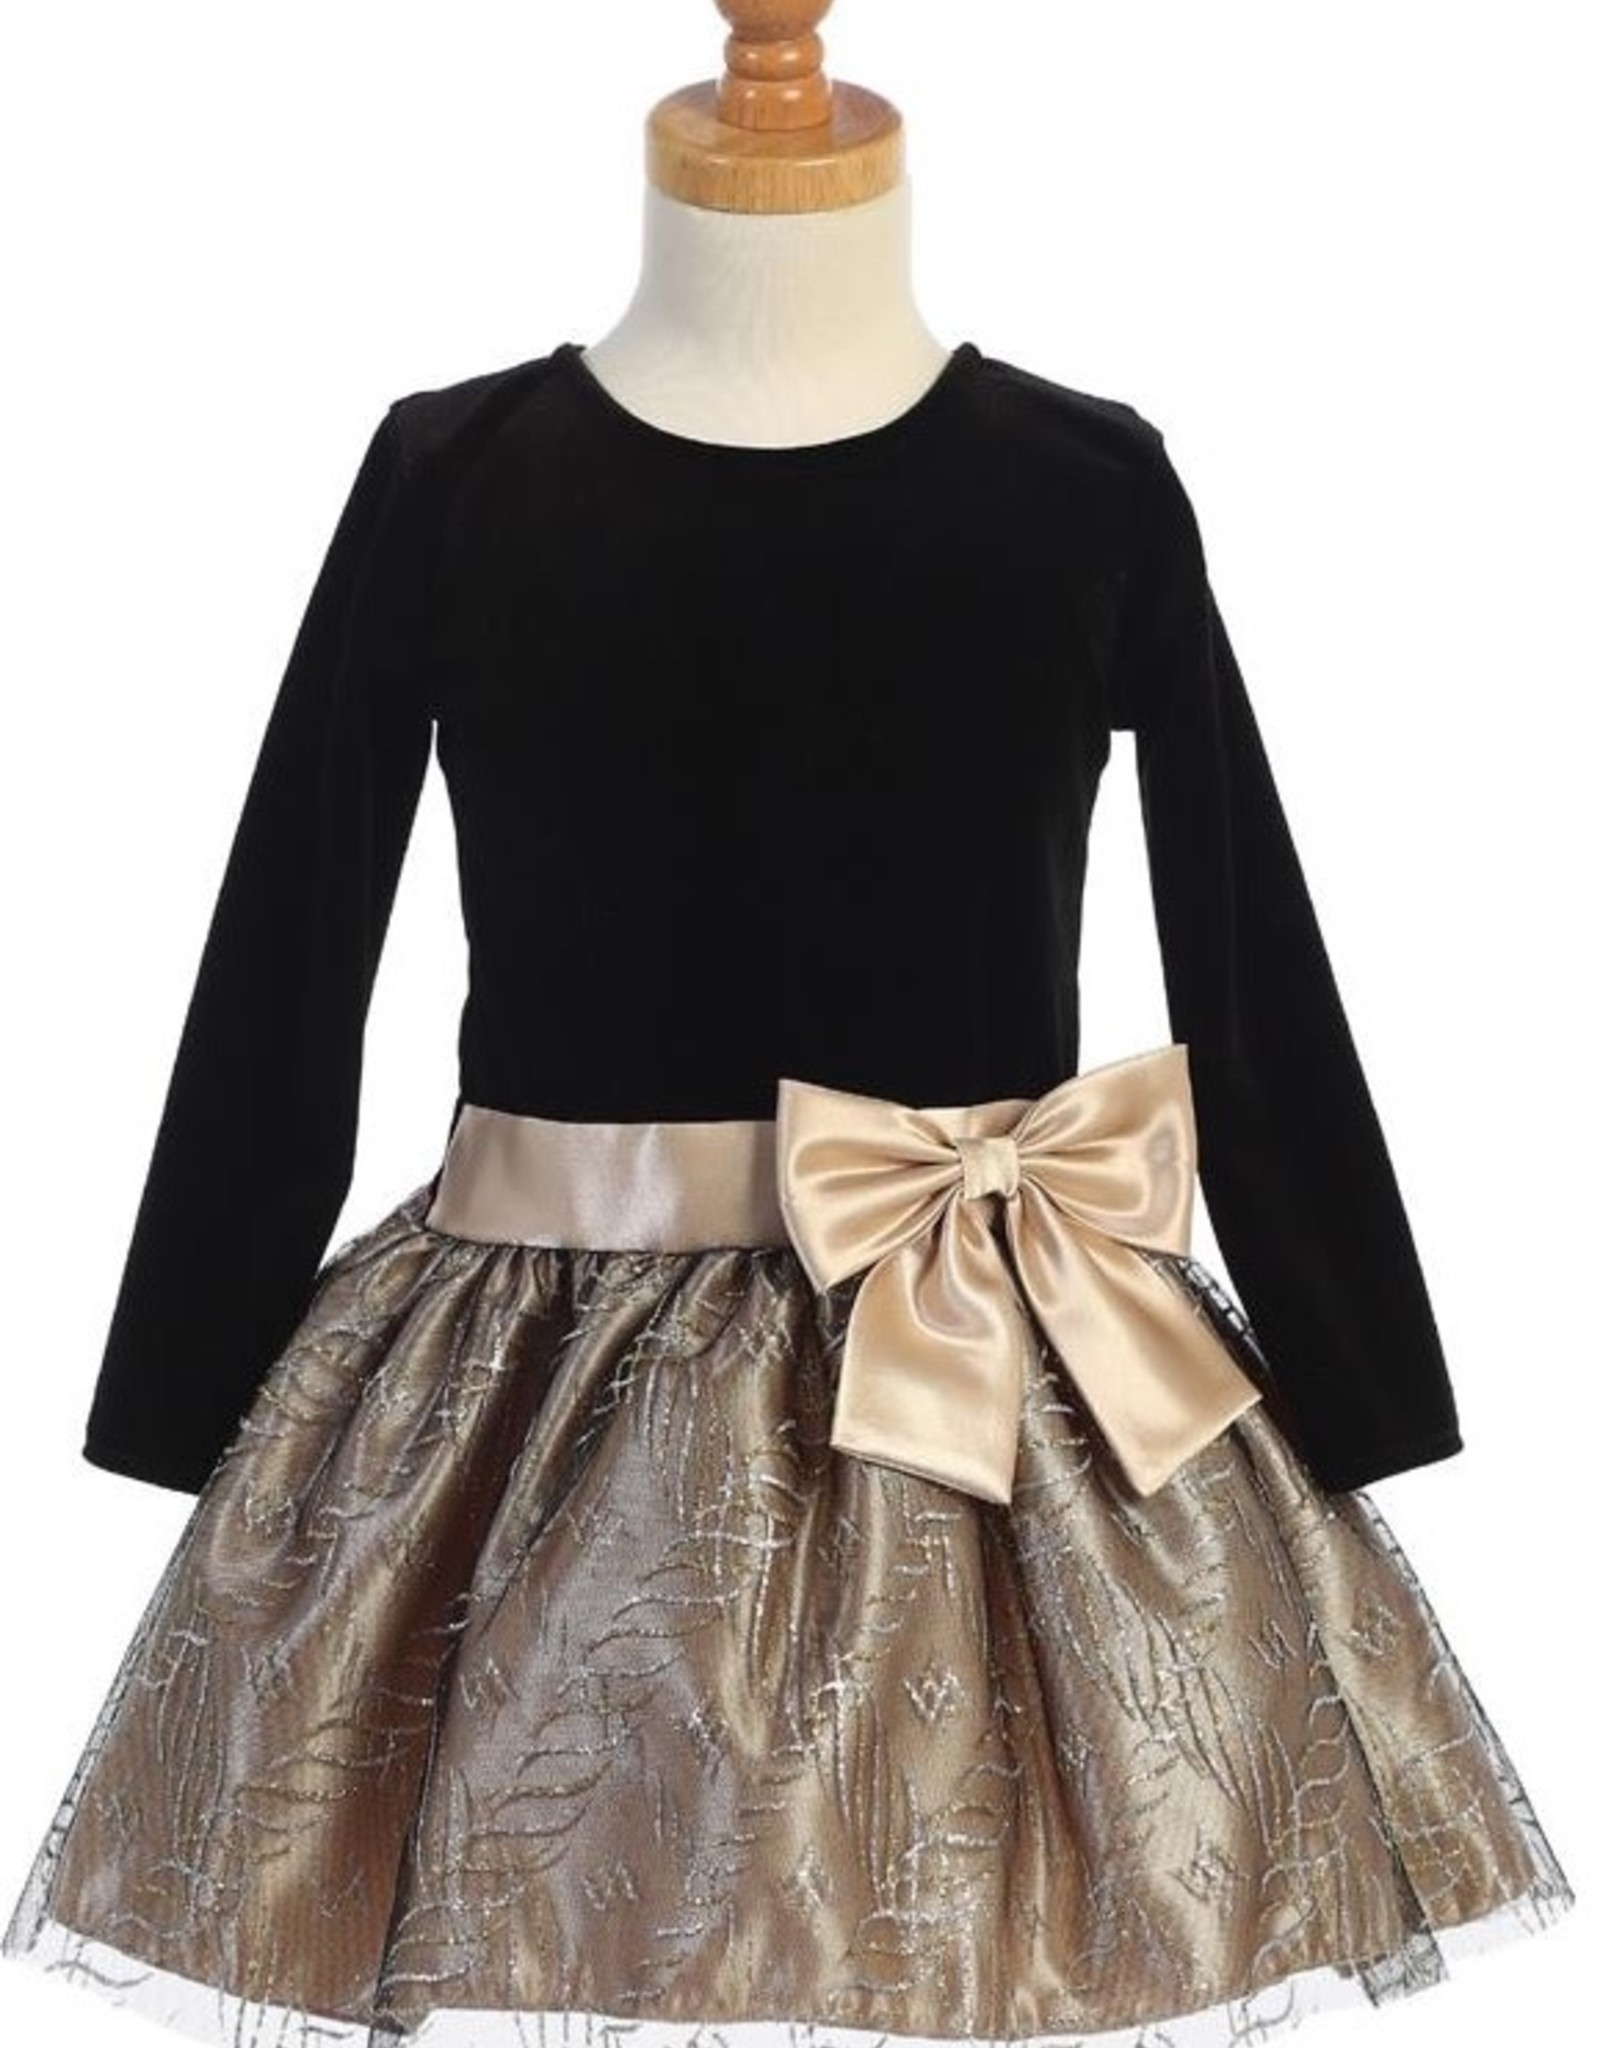 Gld Vlvt Glttr Drop Dress